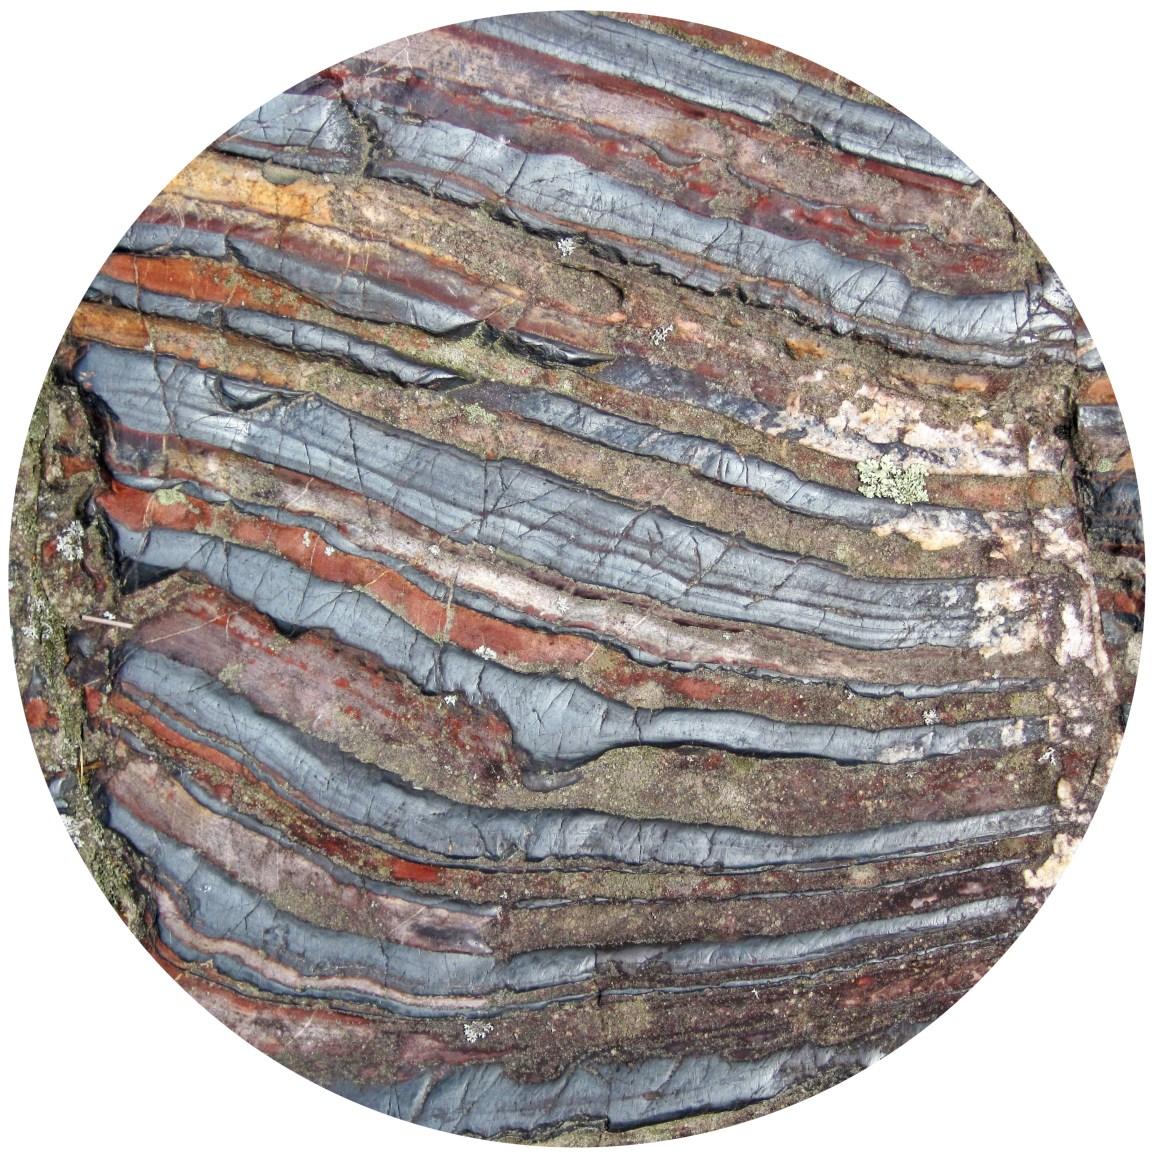 sediment_circle